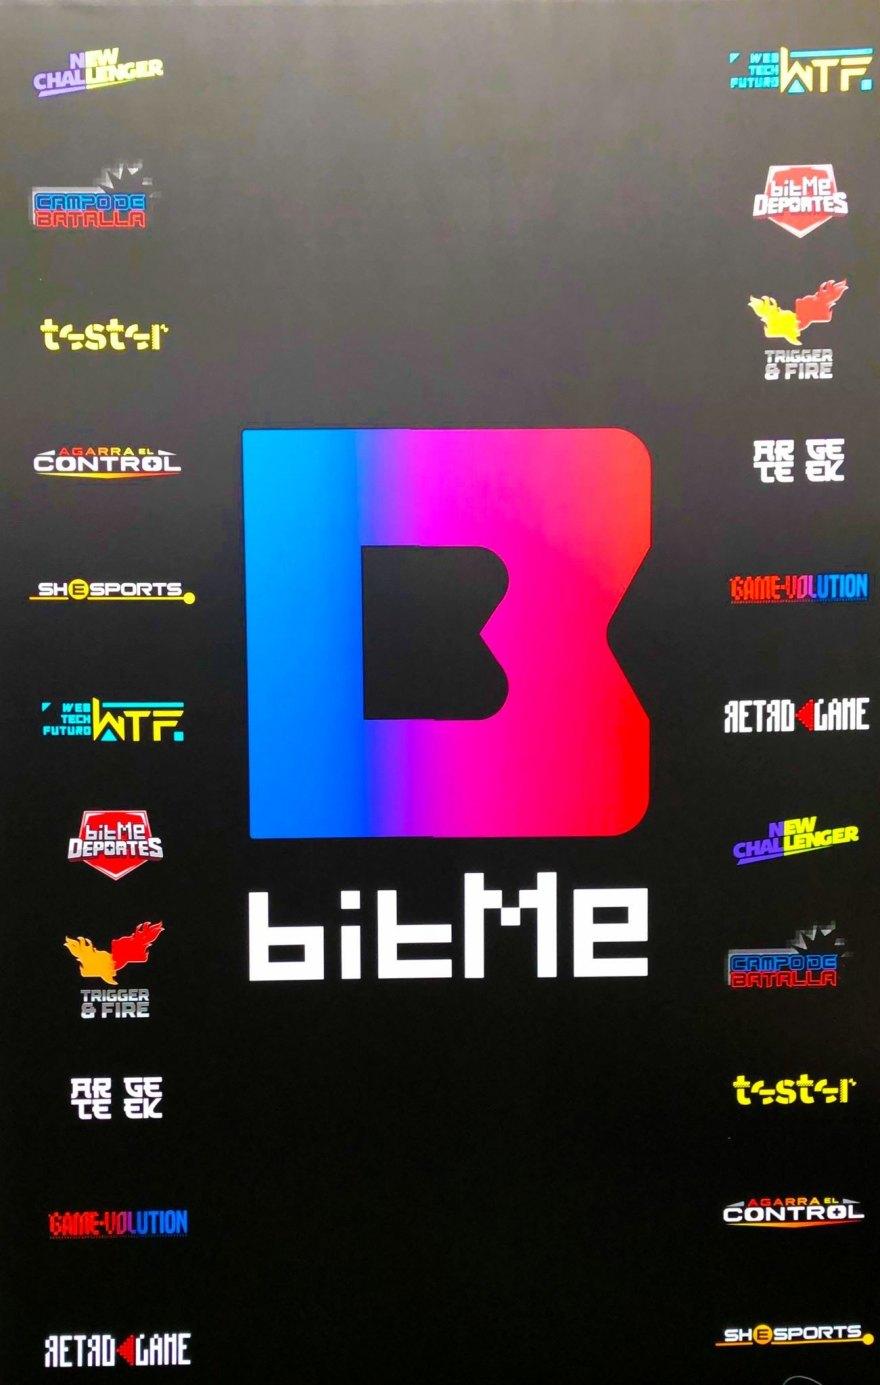 bitme-canal-mexico-anime-esports-2019.jpg